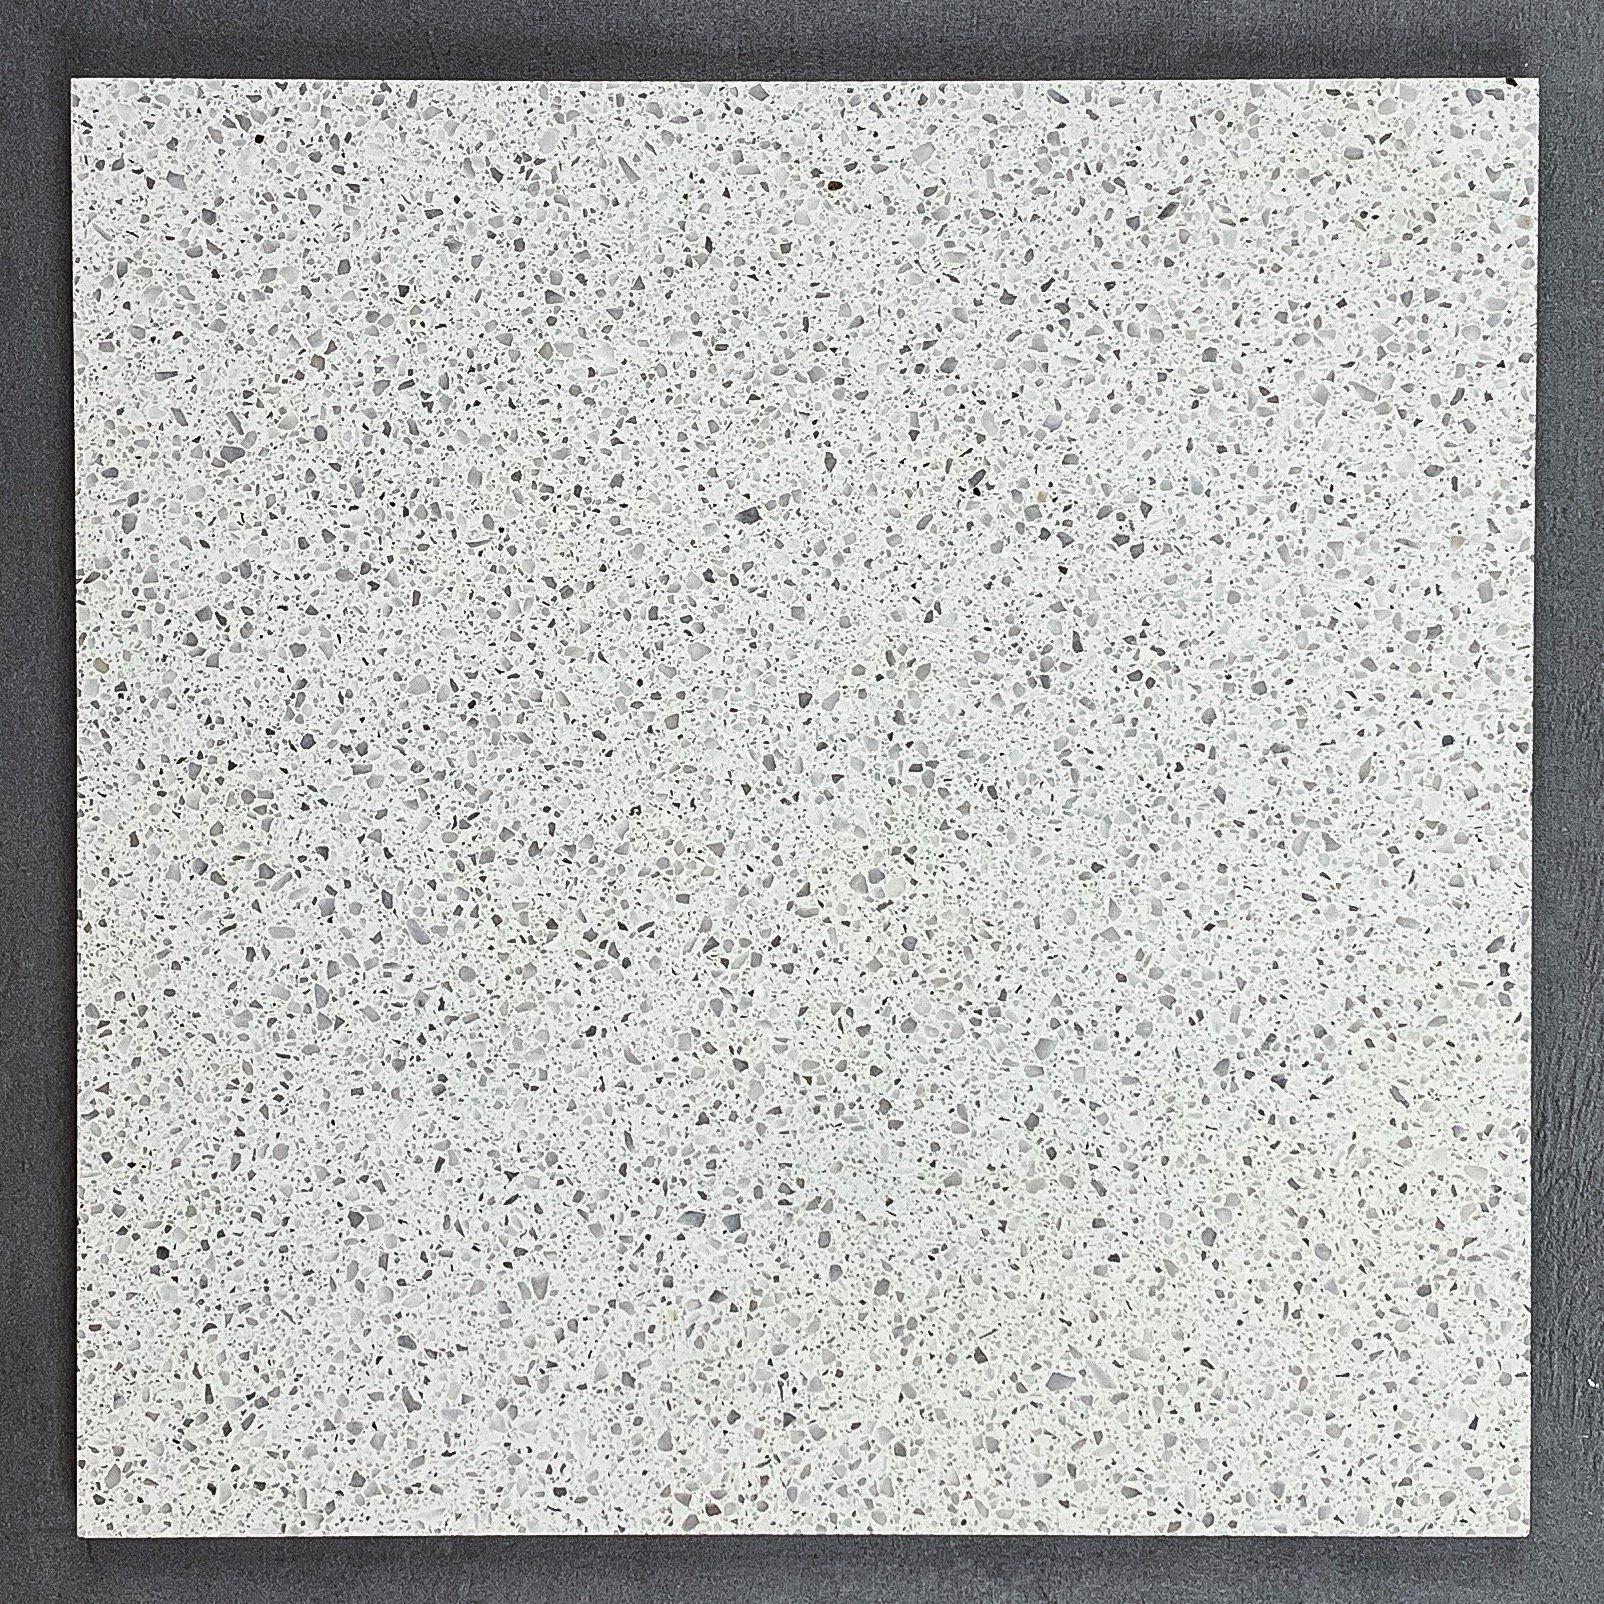 wc2- Terrazzo Resin tiles